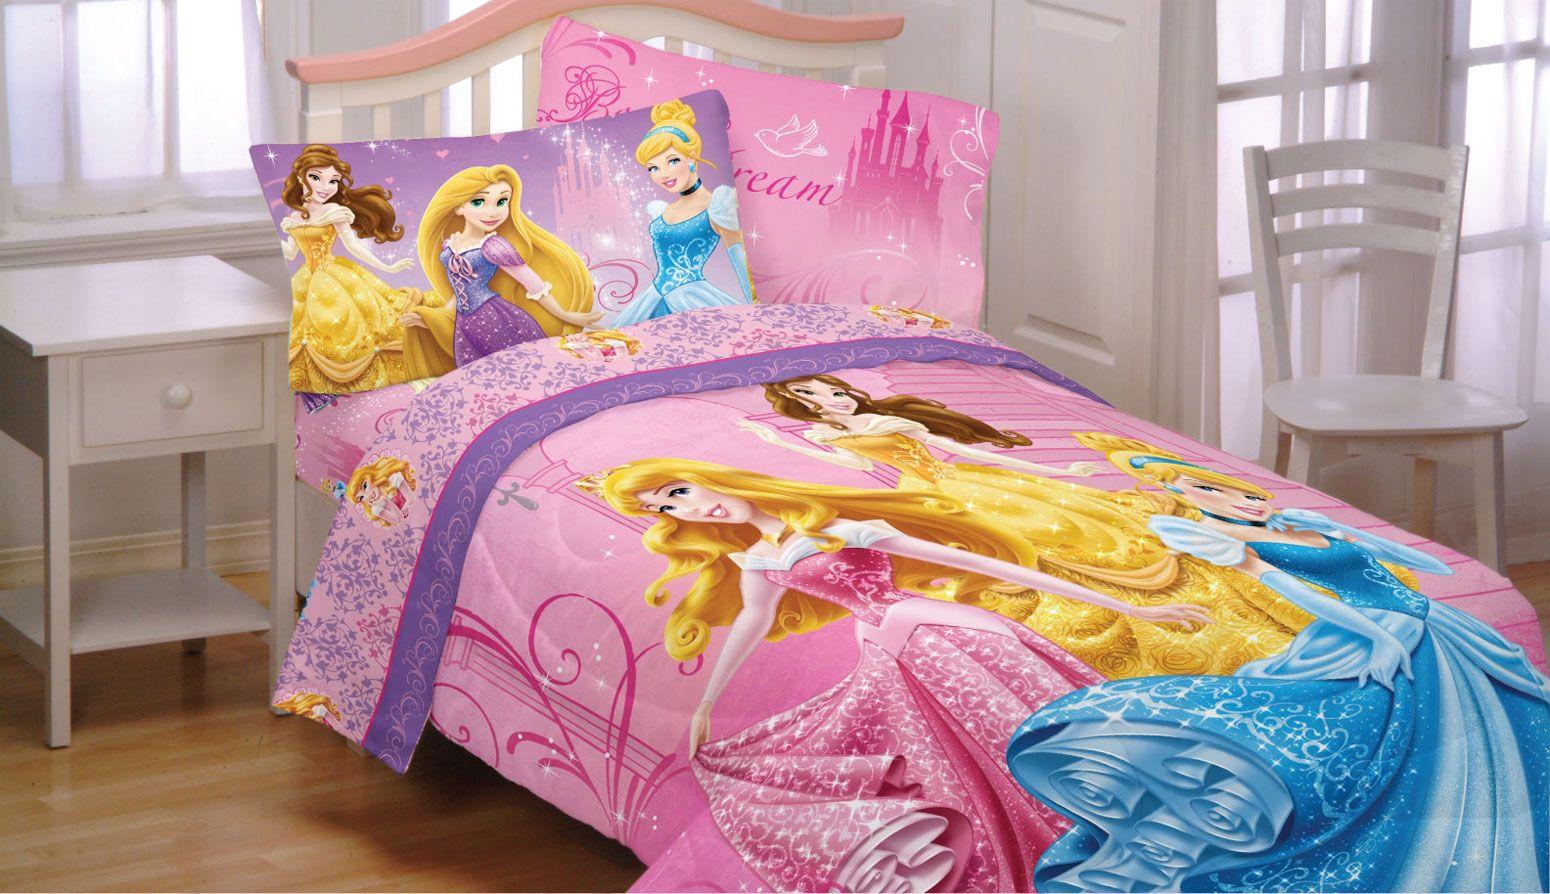 Modern Image Of Princess Bed Sets Disney Princess Bedding And